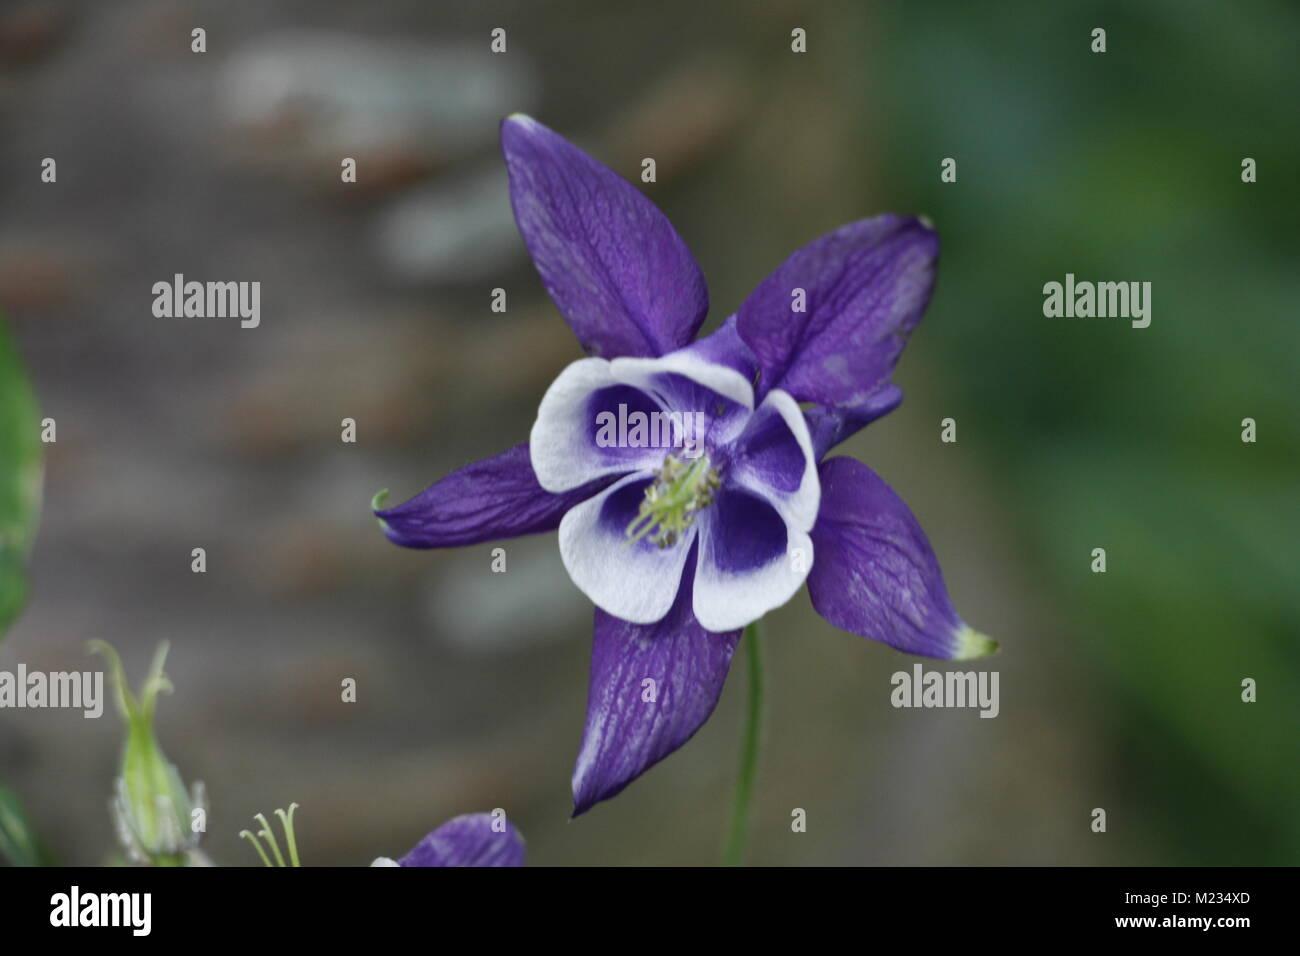 Columbine flowers spring flowers beautiful colors - Stock Image